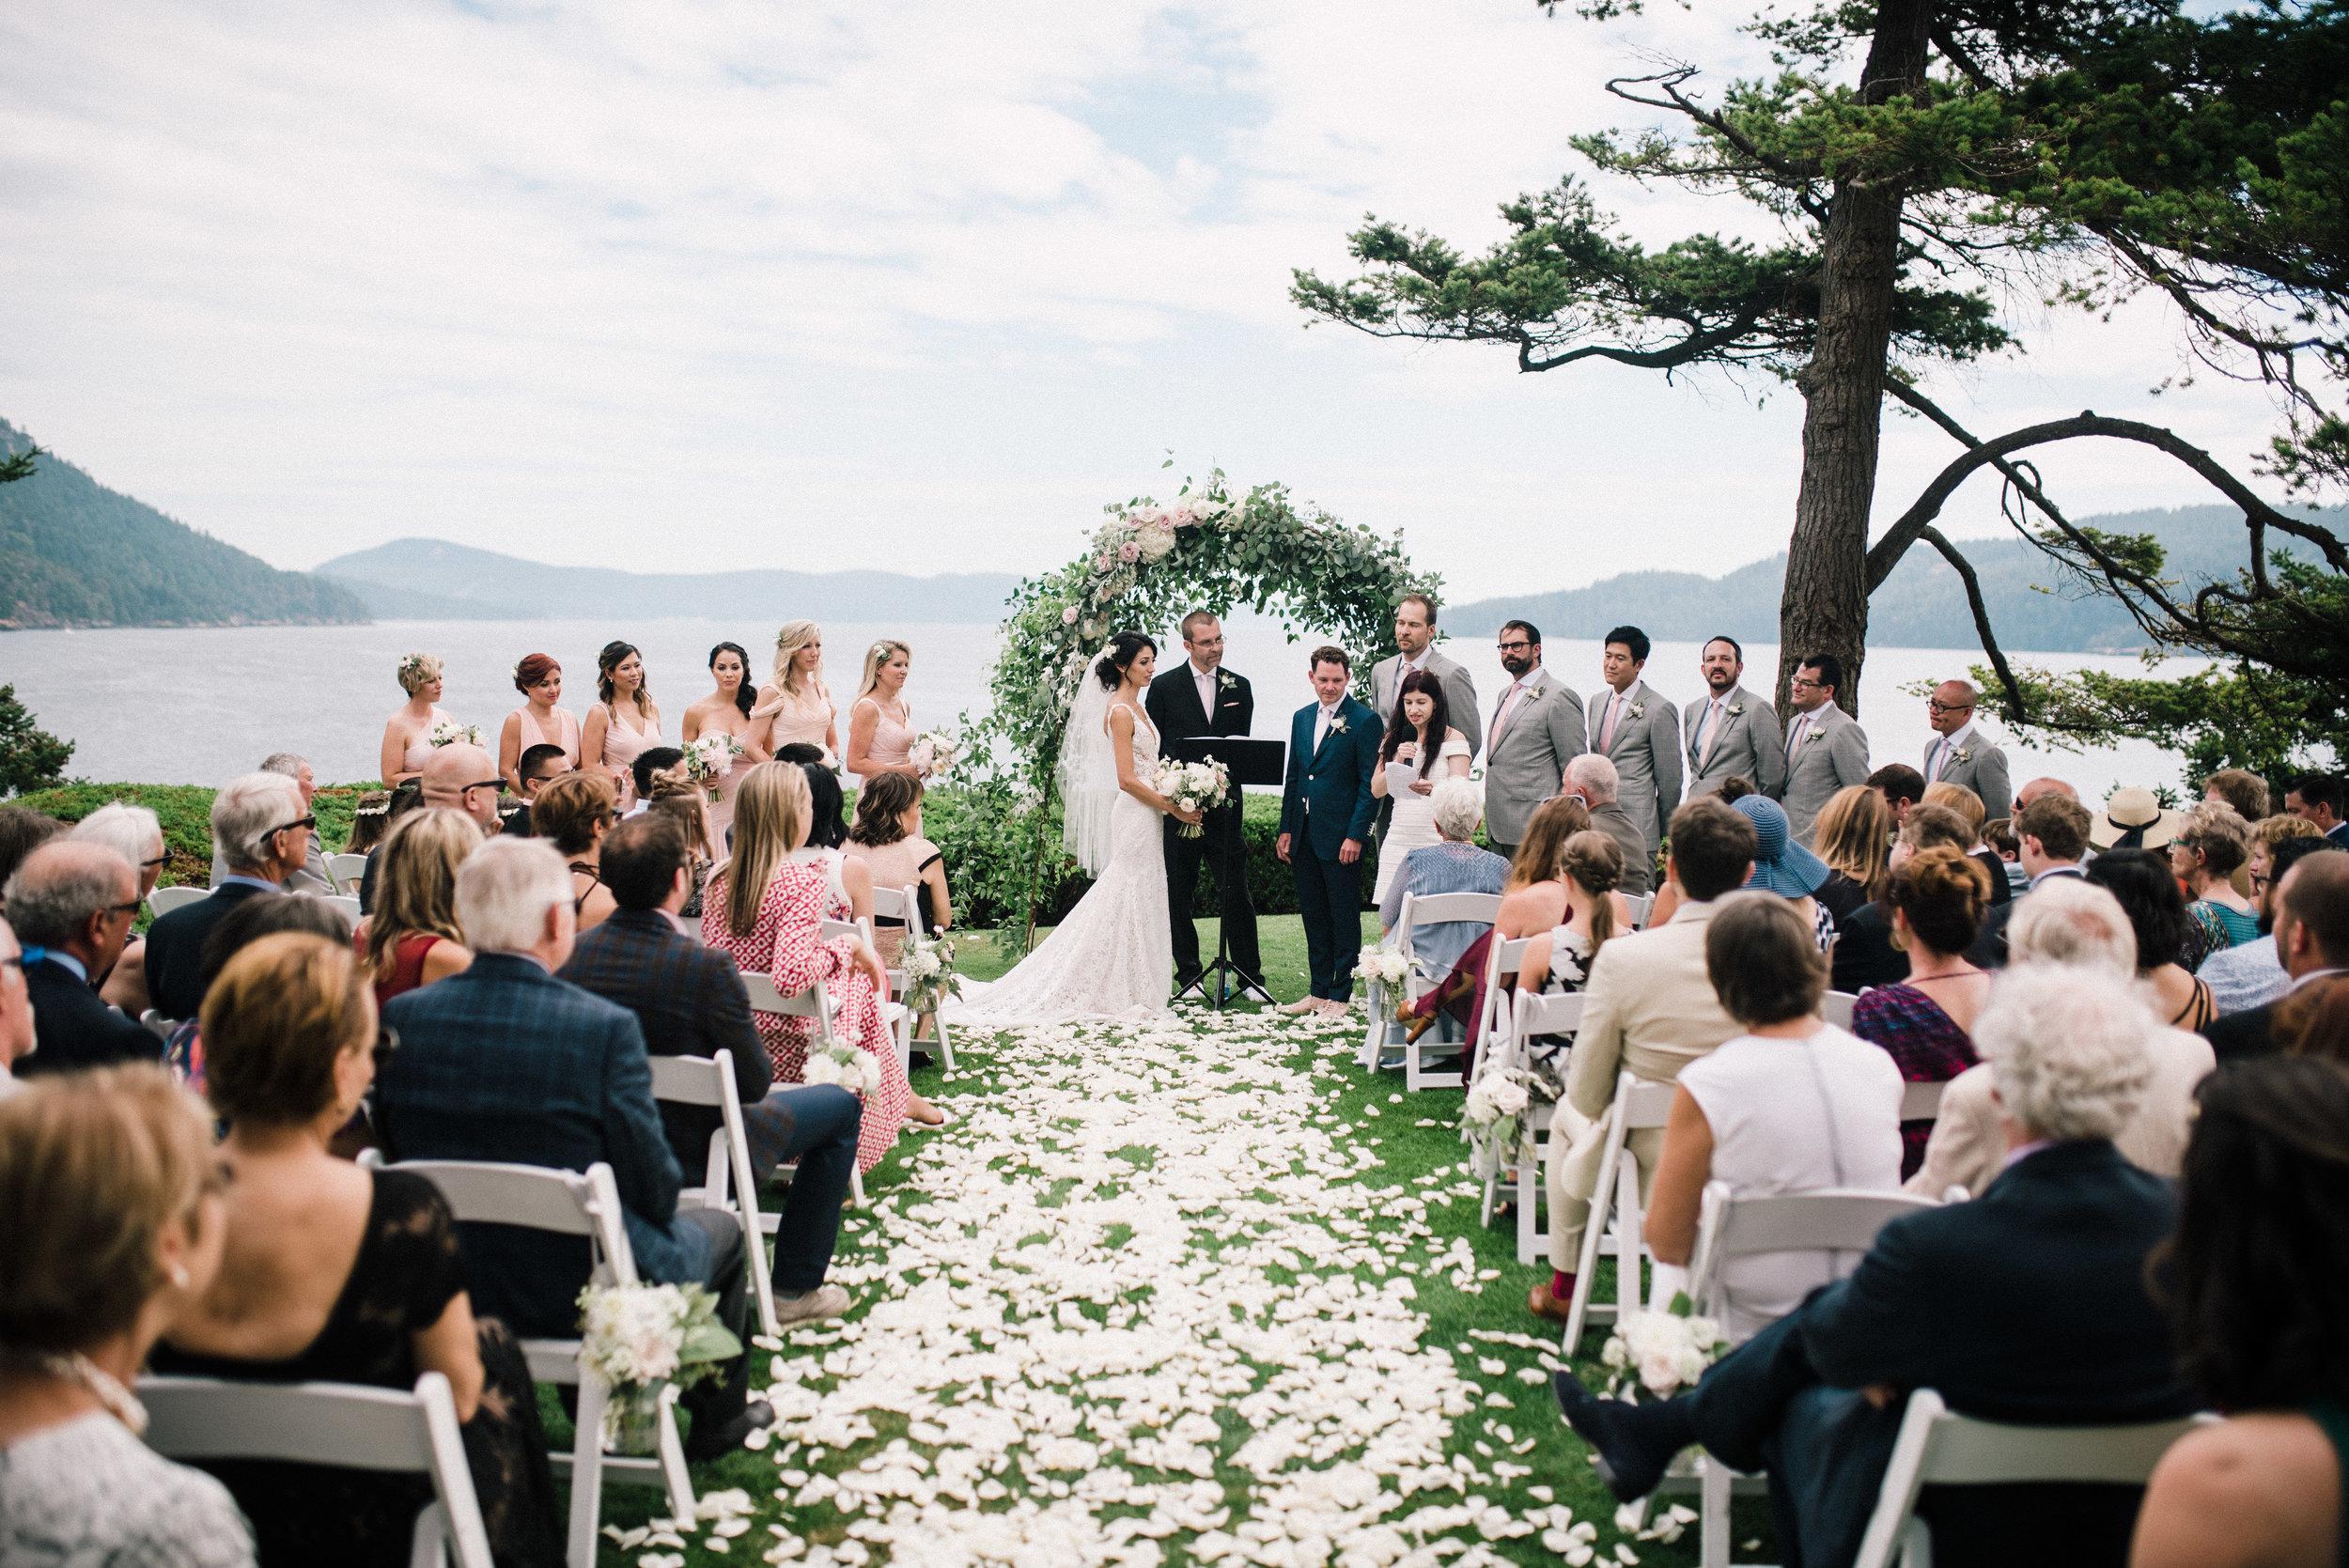 rosario-resort-orcas-island-wedding-ryan-flynn-photography-md-ceremony-0083.JPG